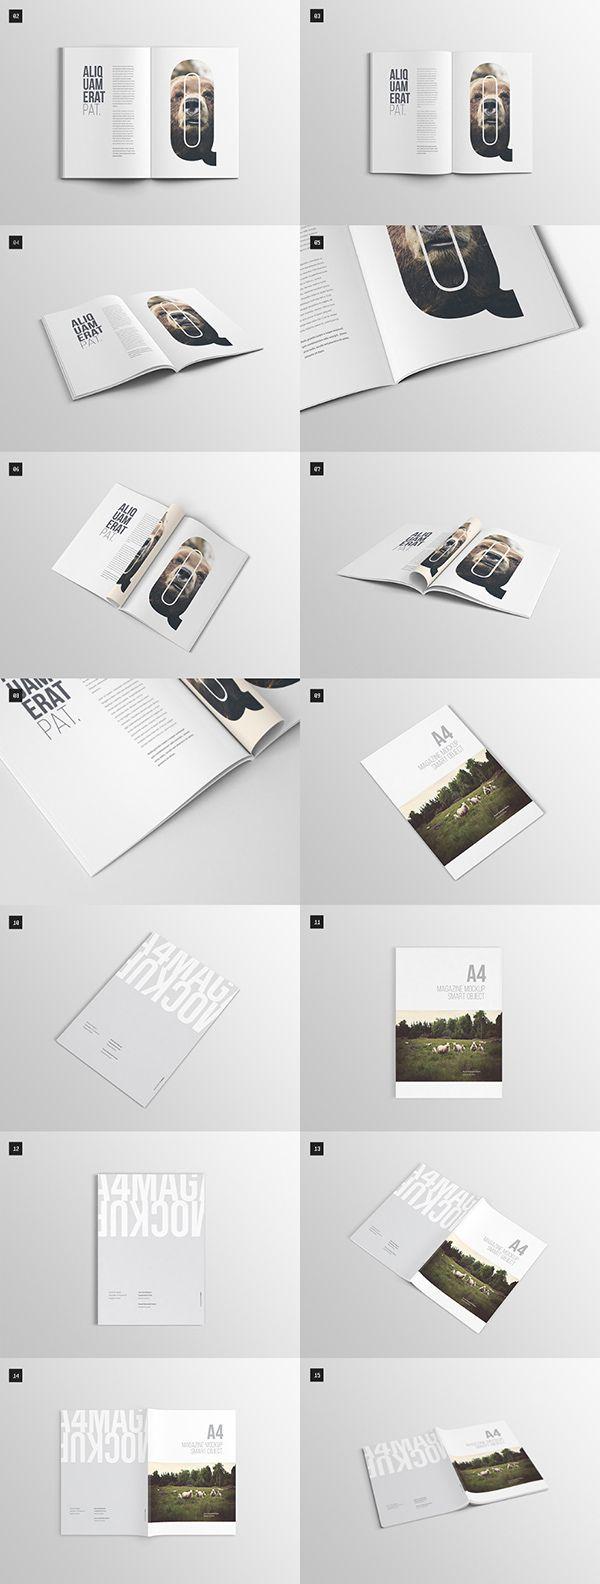 75 free psd magazine book cover brochure mock ups mock ups 20 free magazine book brochure psd mock up templates maxwellsz